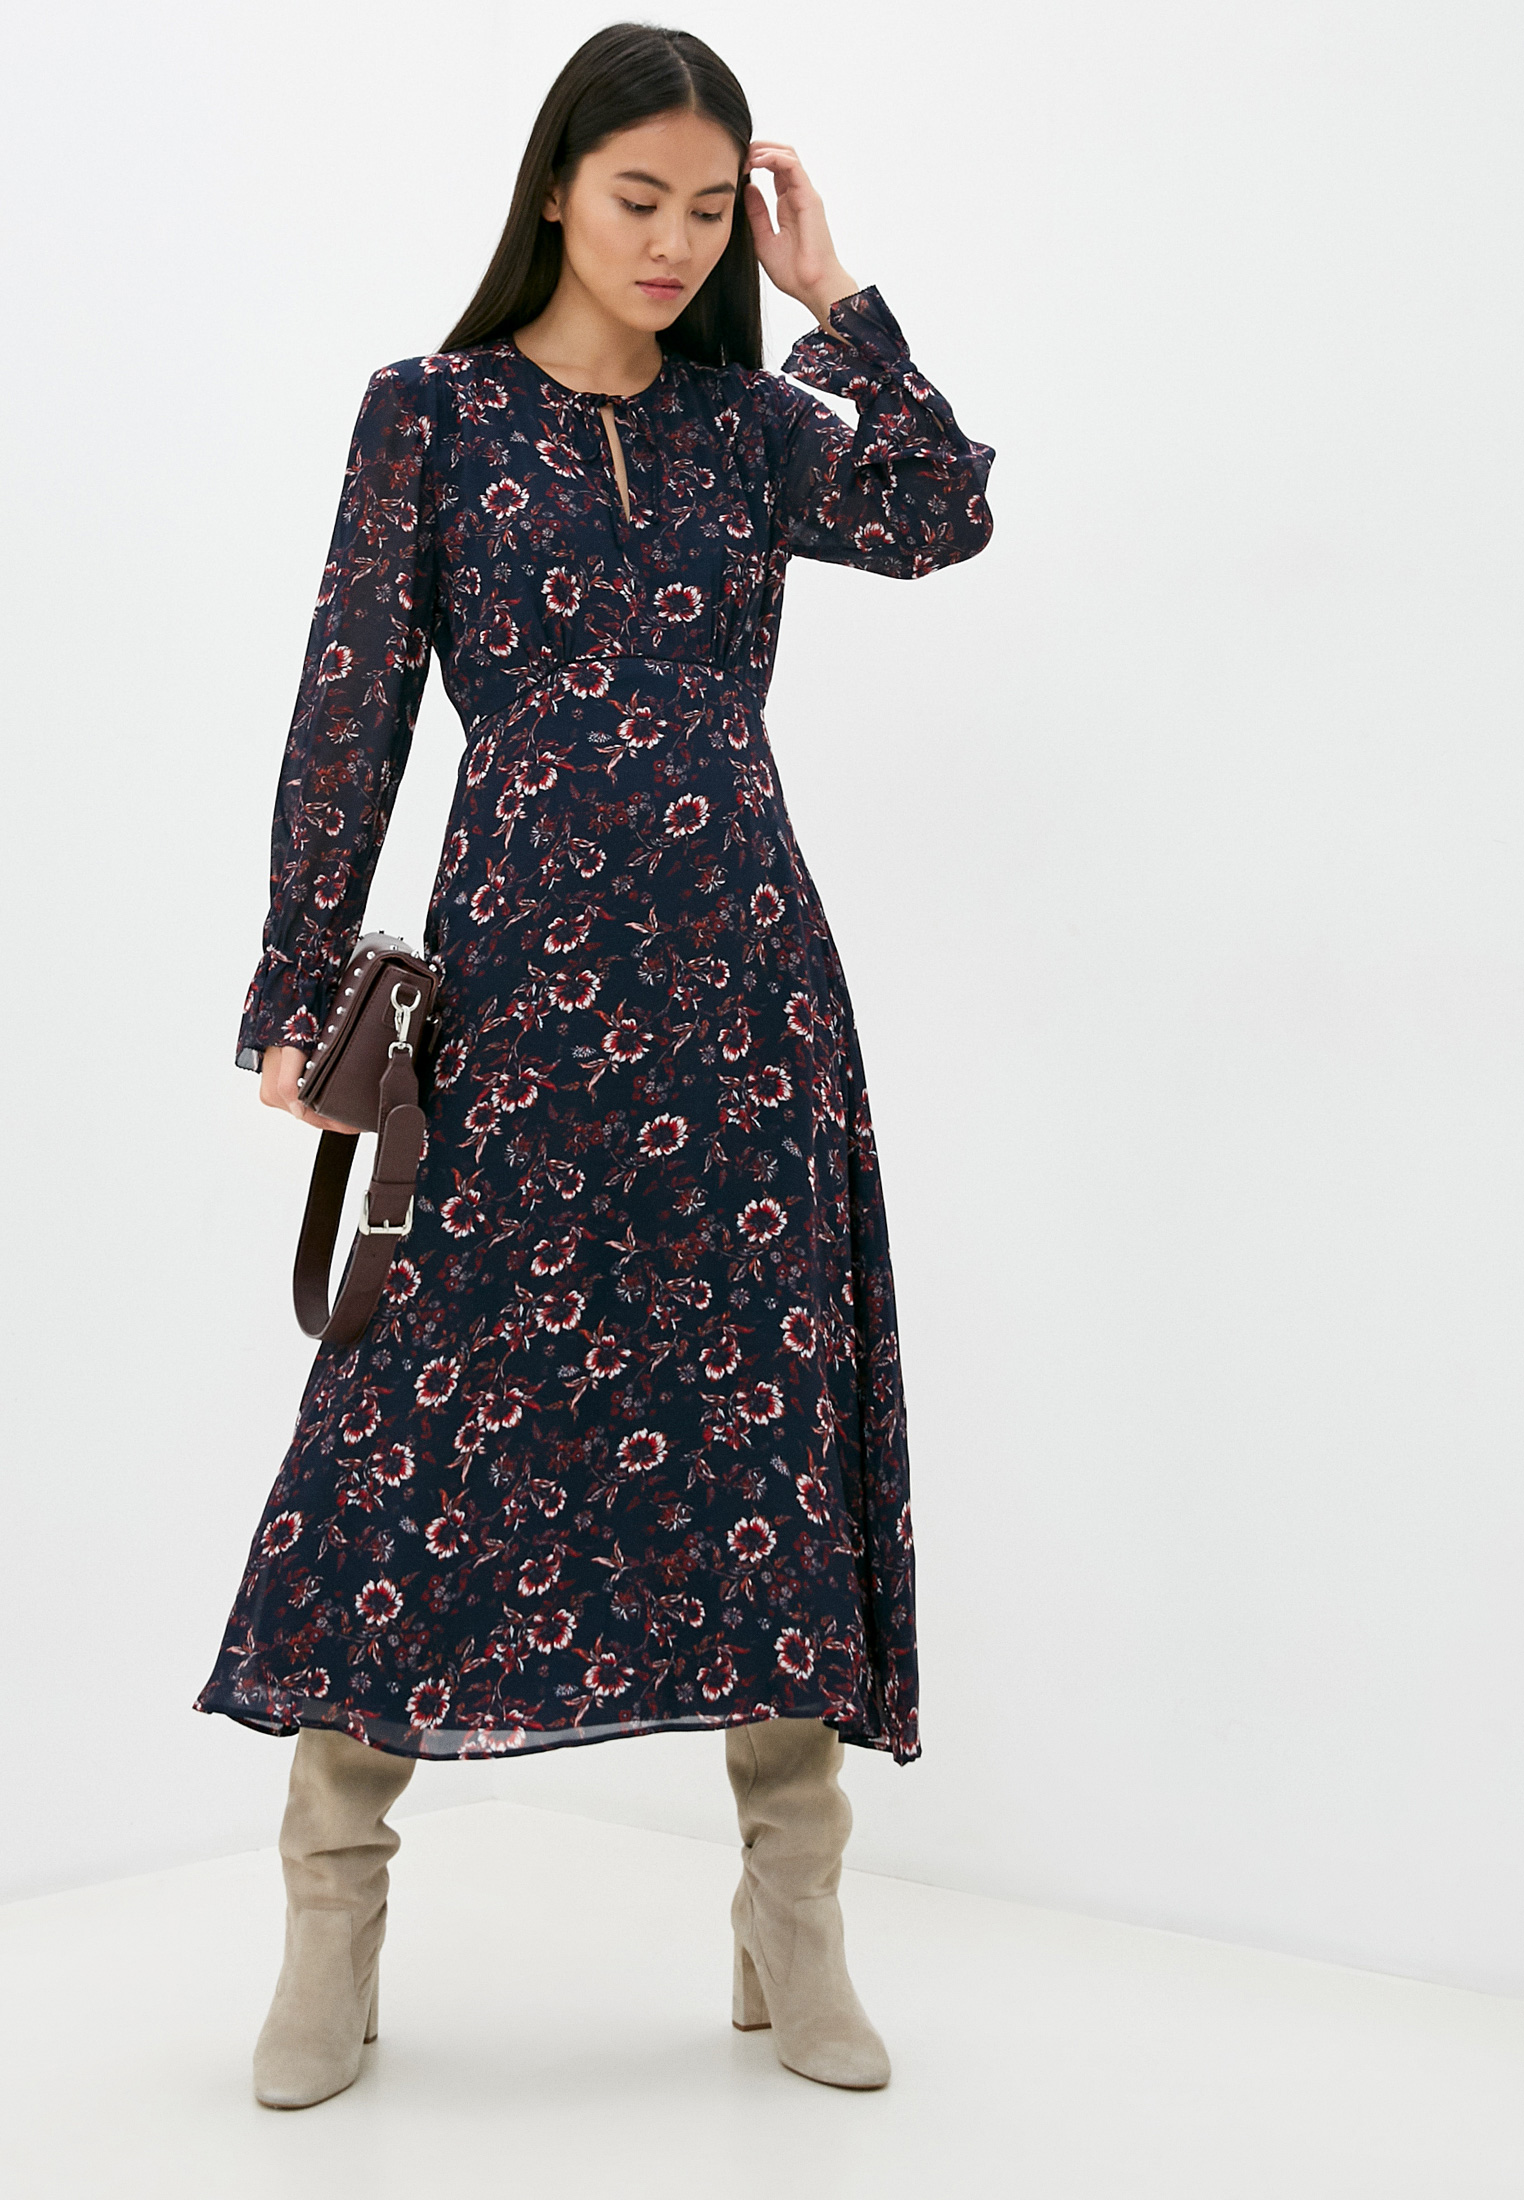 Платье Tommy Hilfiger (Томми Хилфигер) WW0WW28705